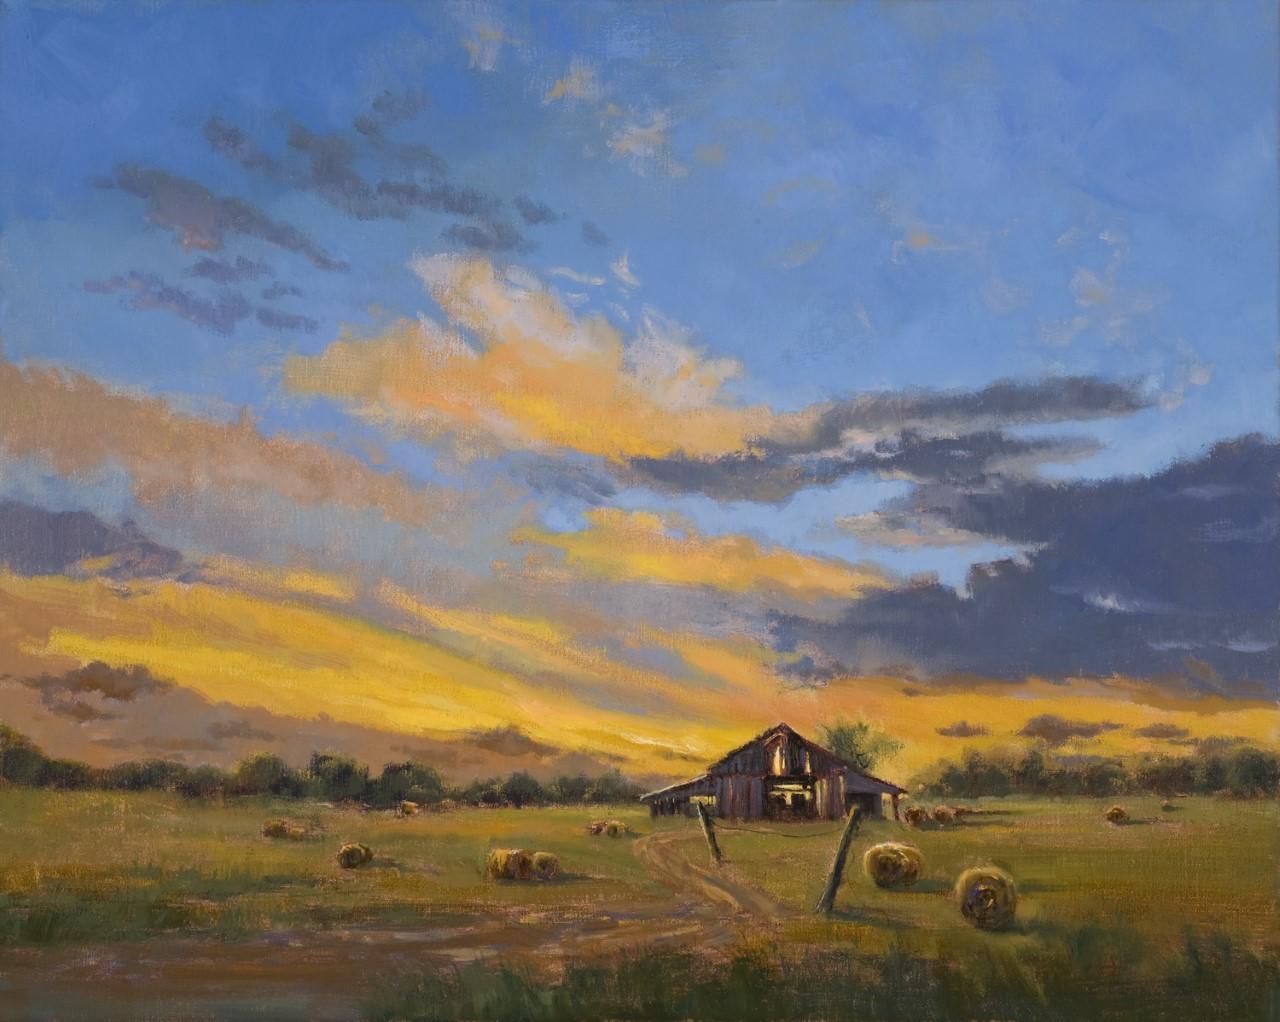 Cecy Turner - Evening Memories